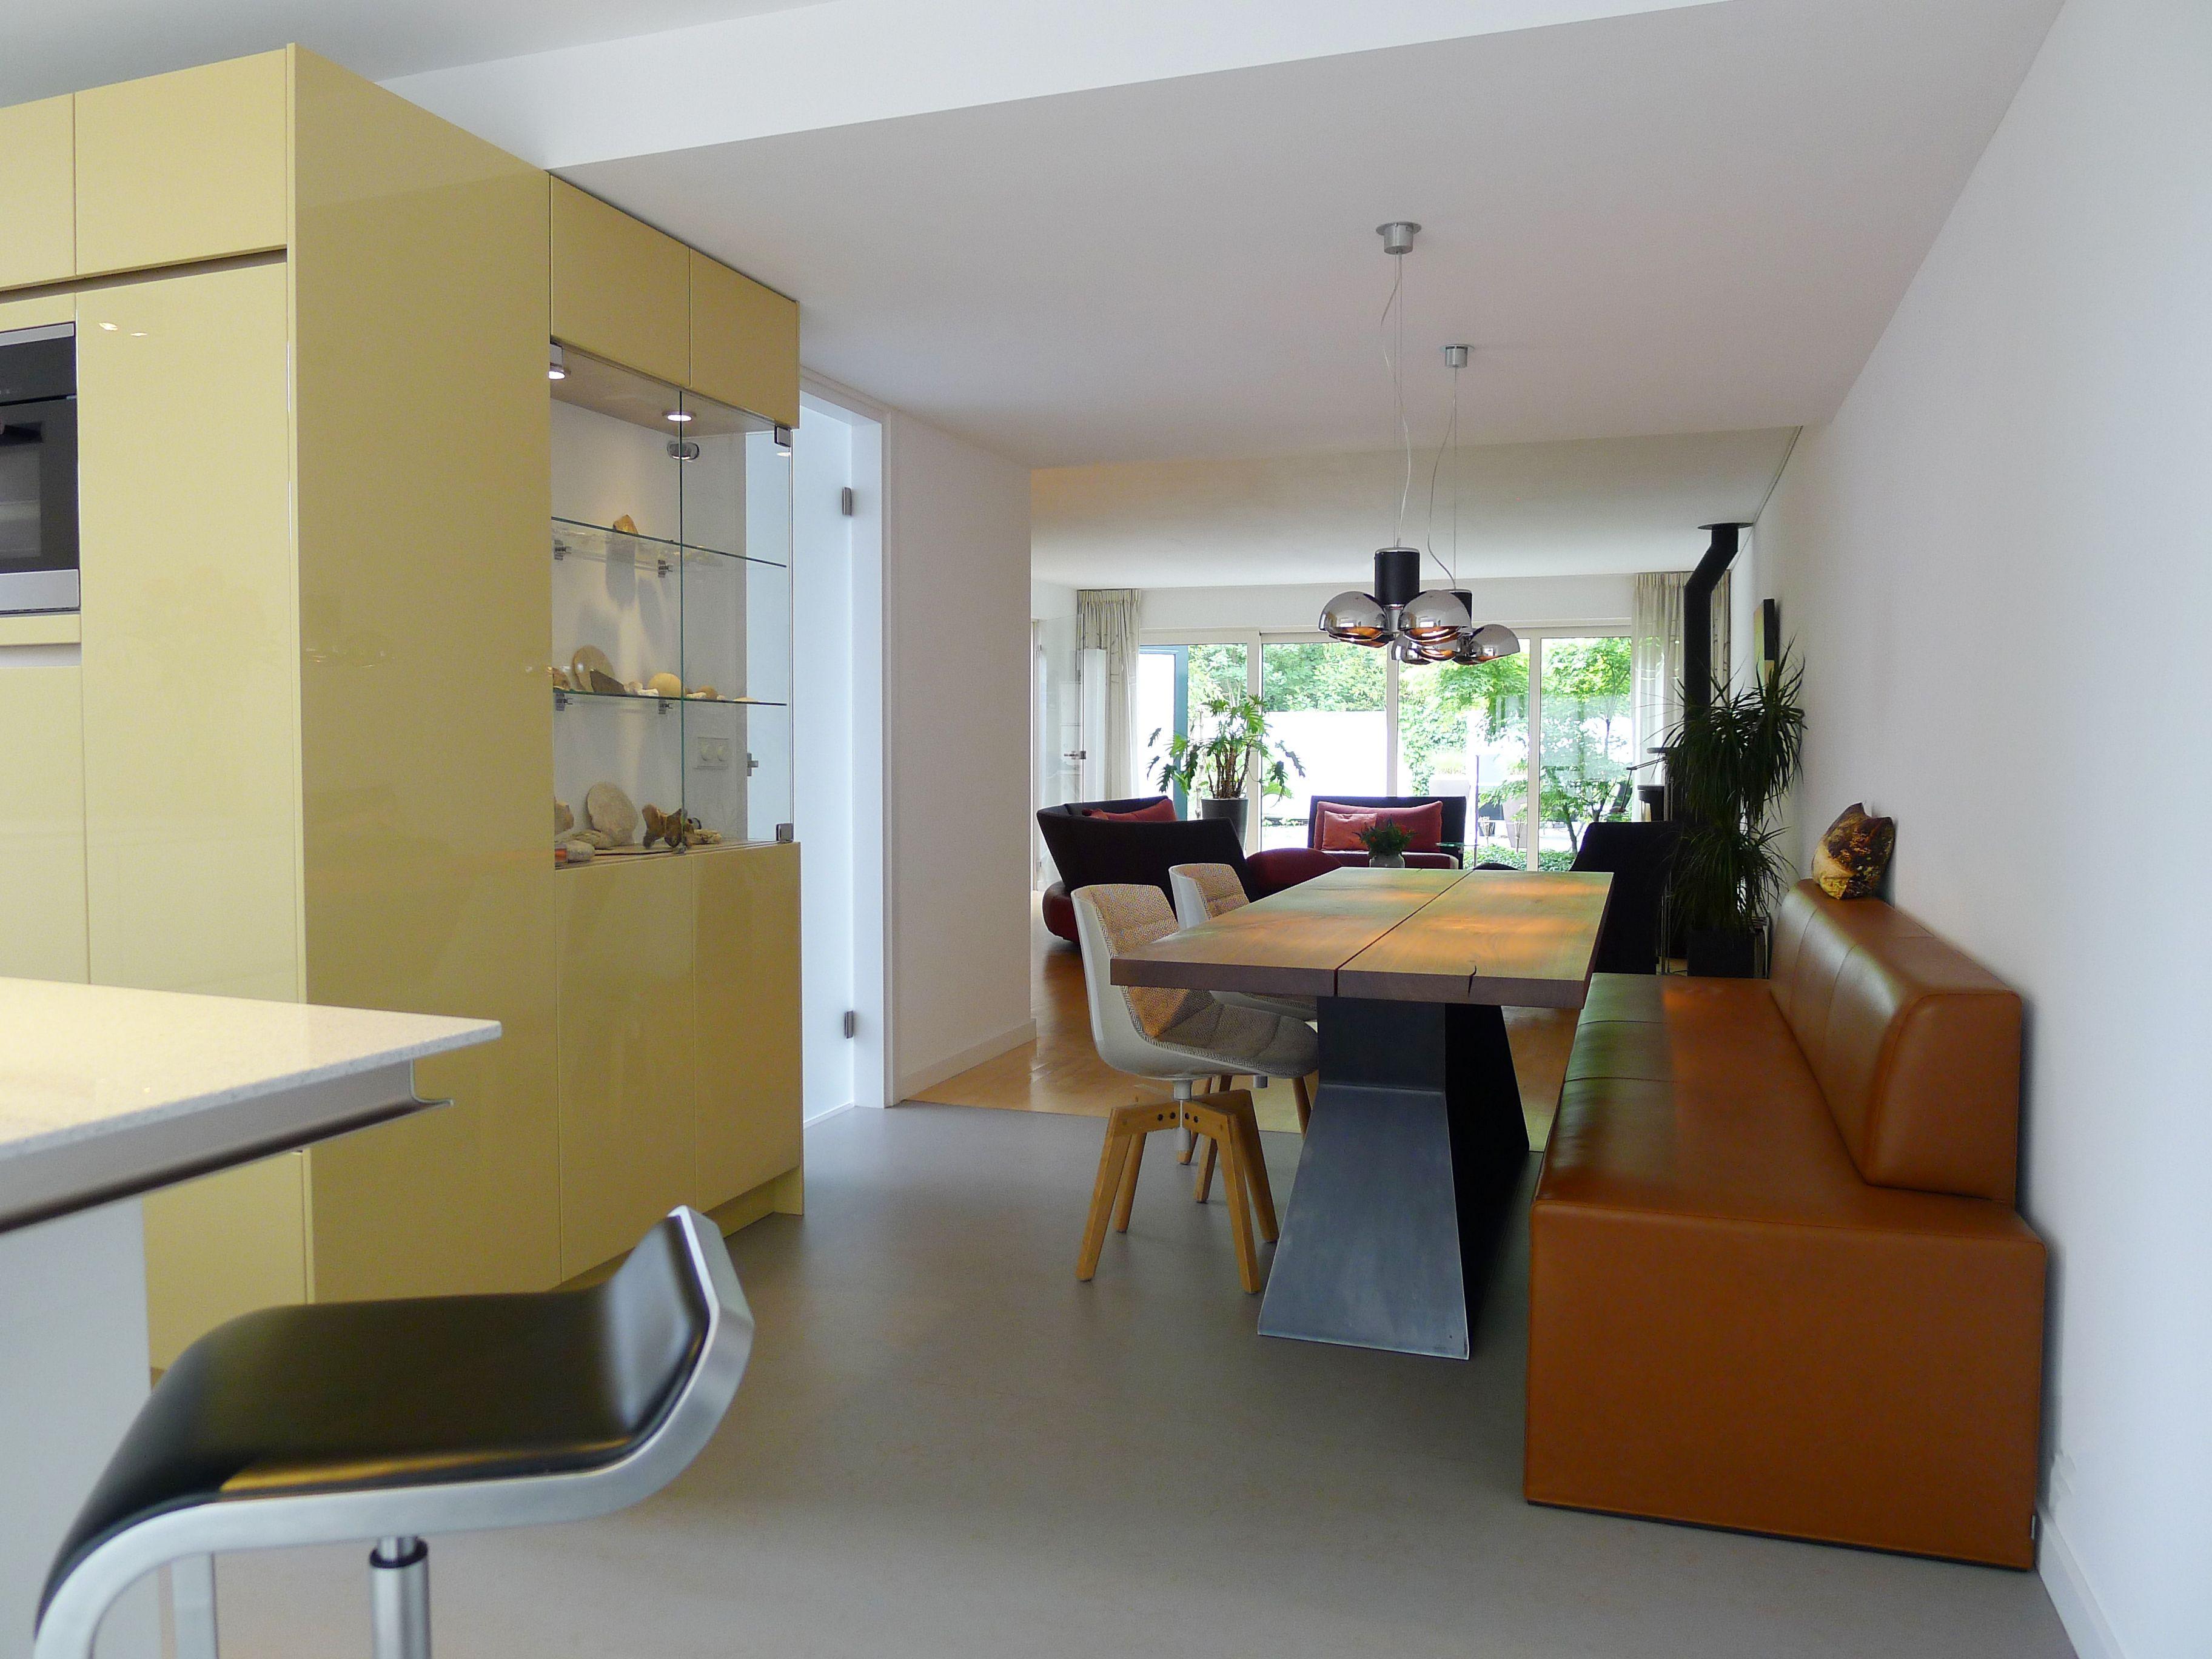 Interieur open keuken particulier dieren inclusief ontwerp keuken